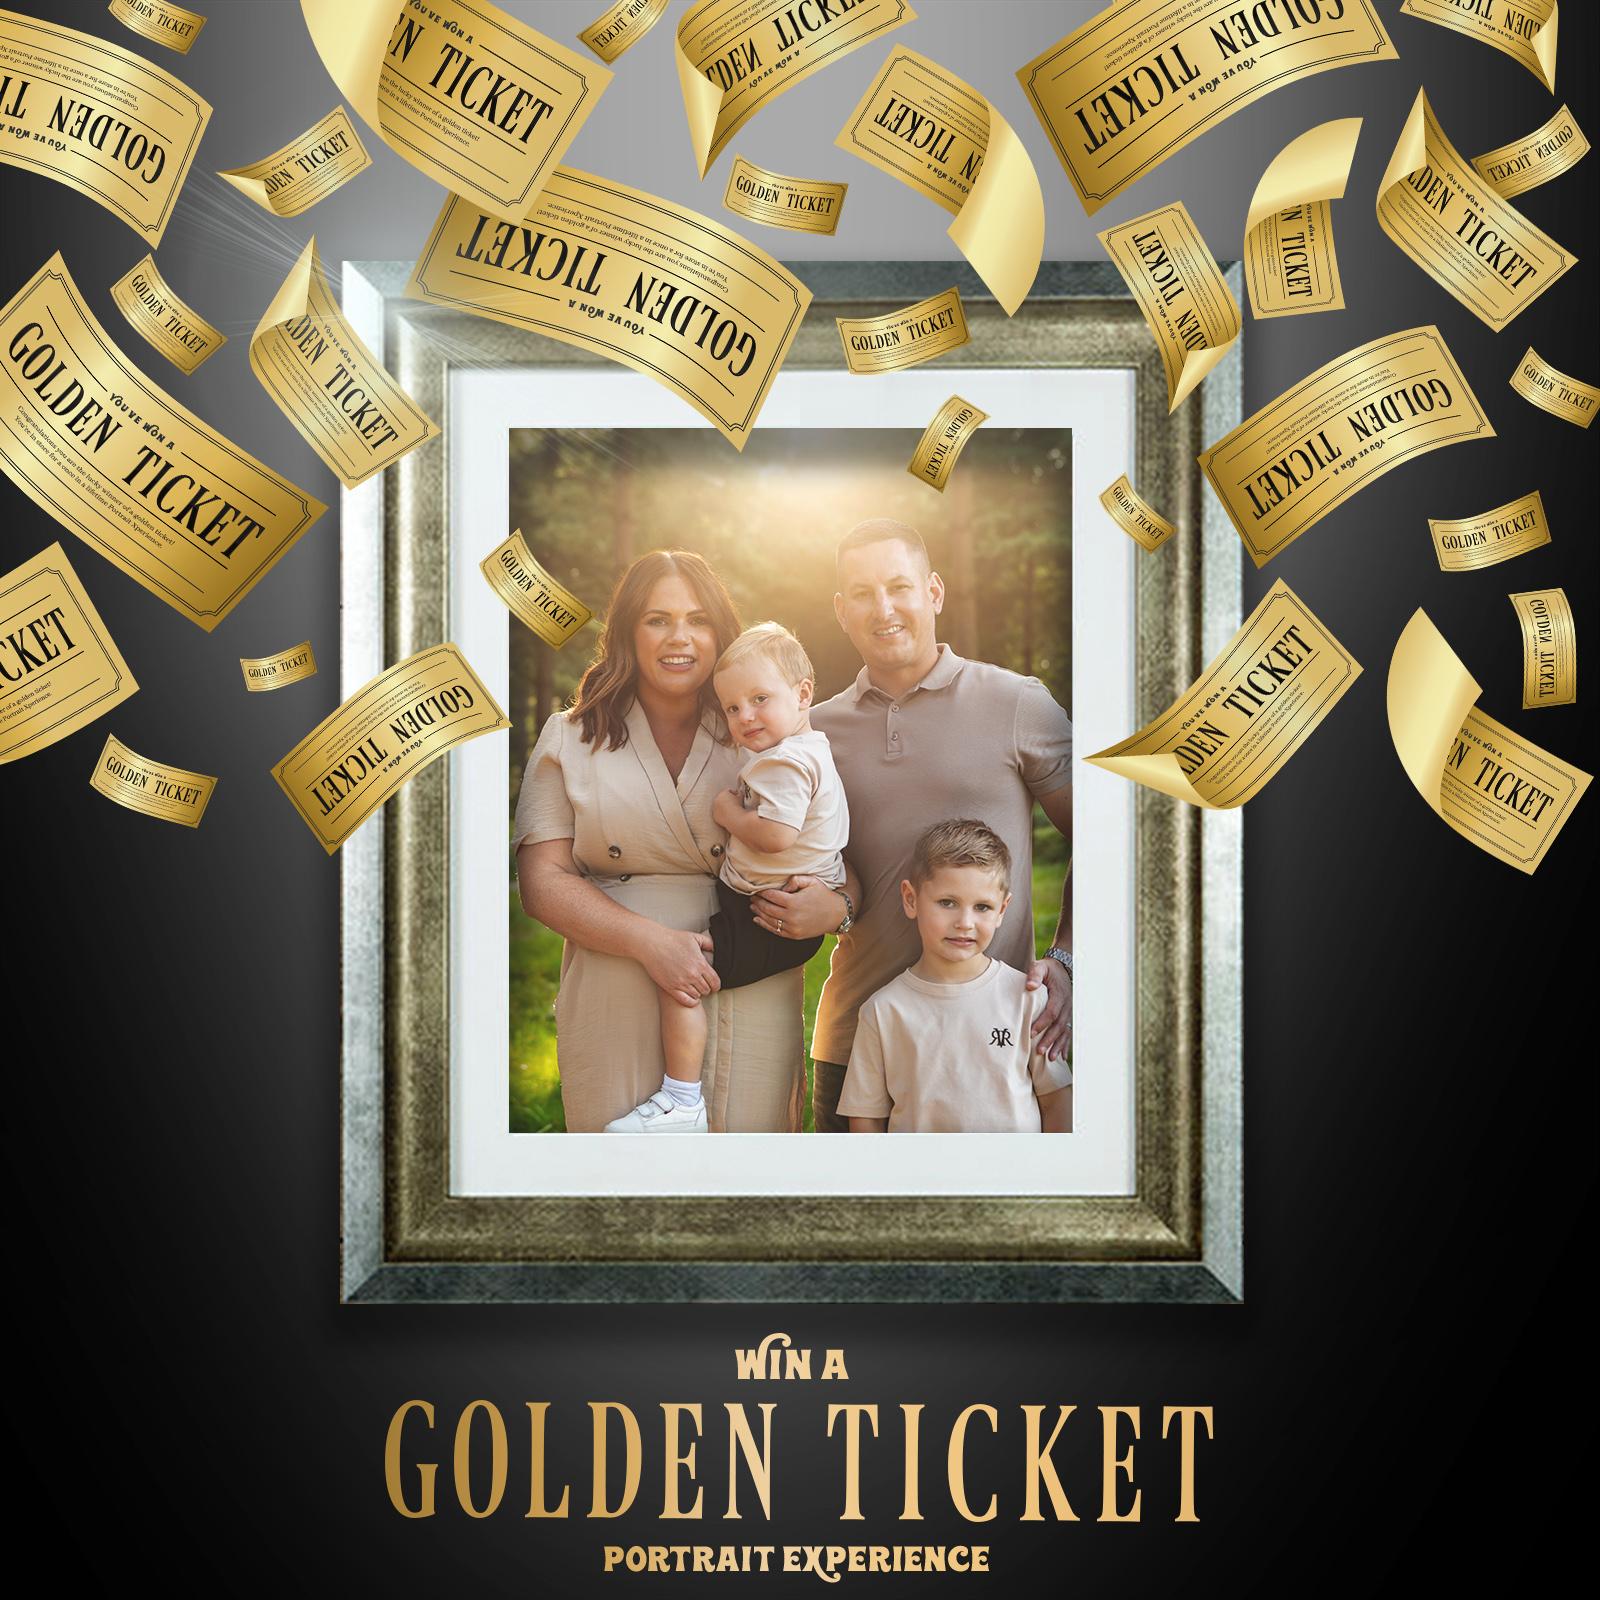 Golden Ticket Portrait Ad